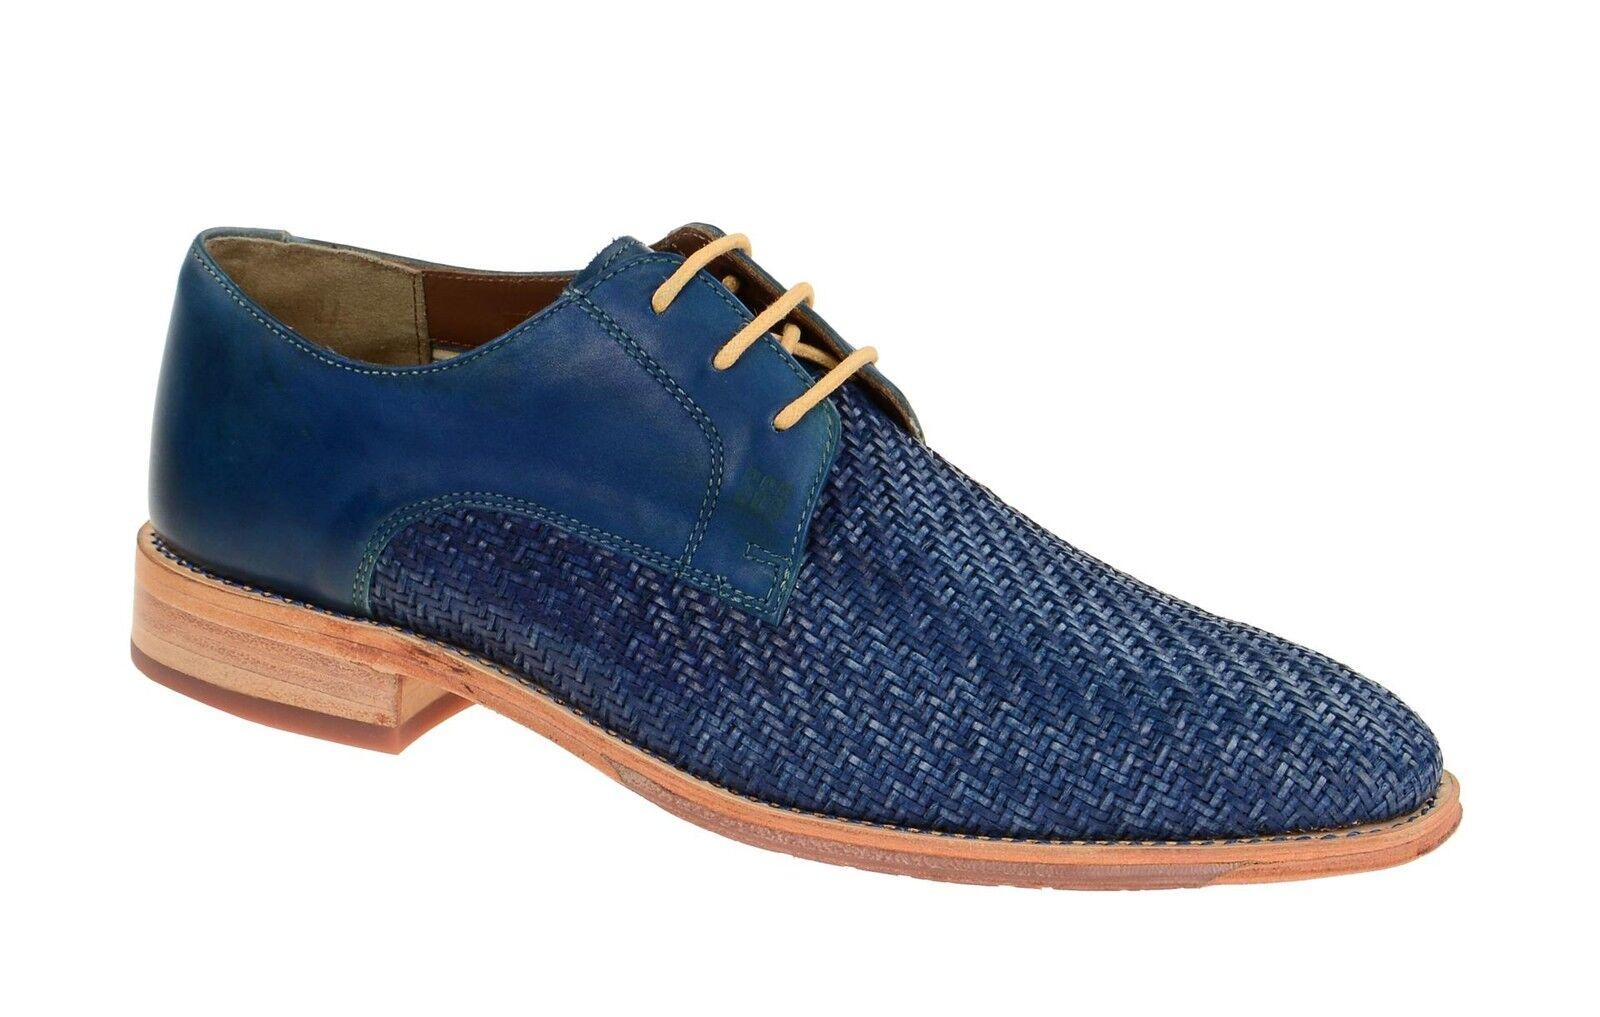 Gordon & Bros. Bros. Bros. Schuhe LORENZO blau Herrenschuhe S160746 navy NEU 50ee65